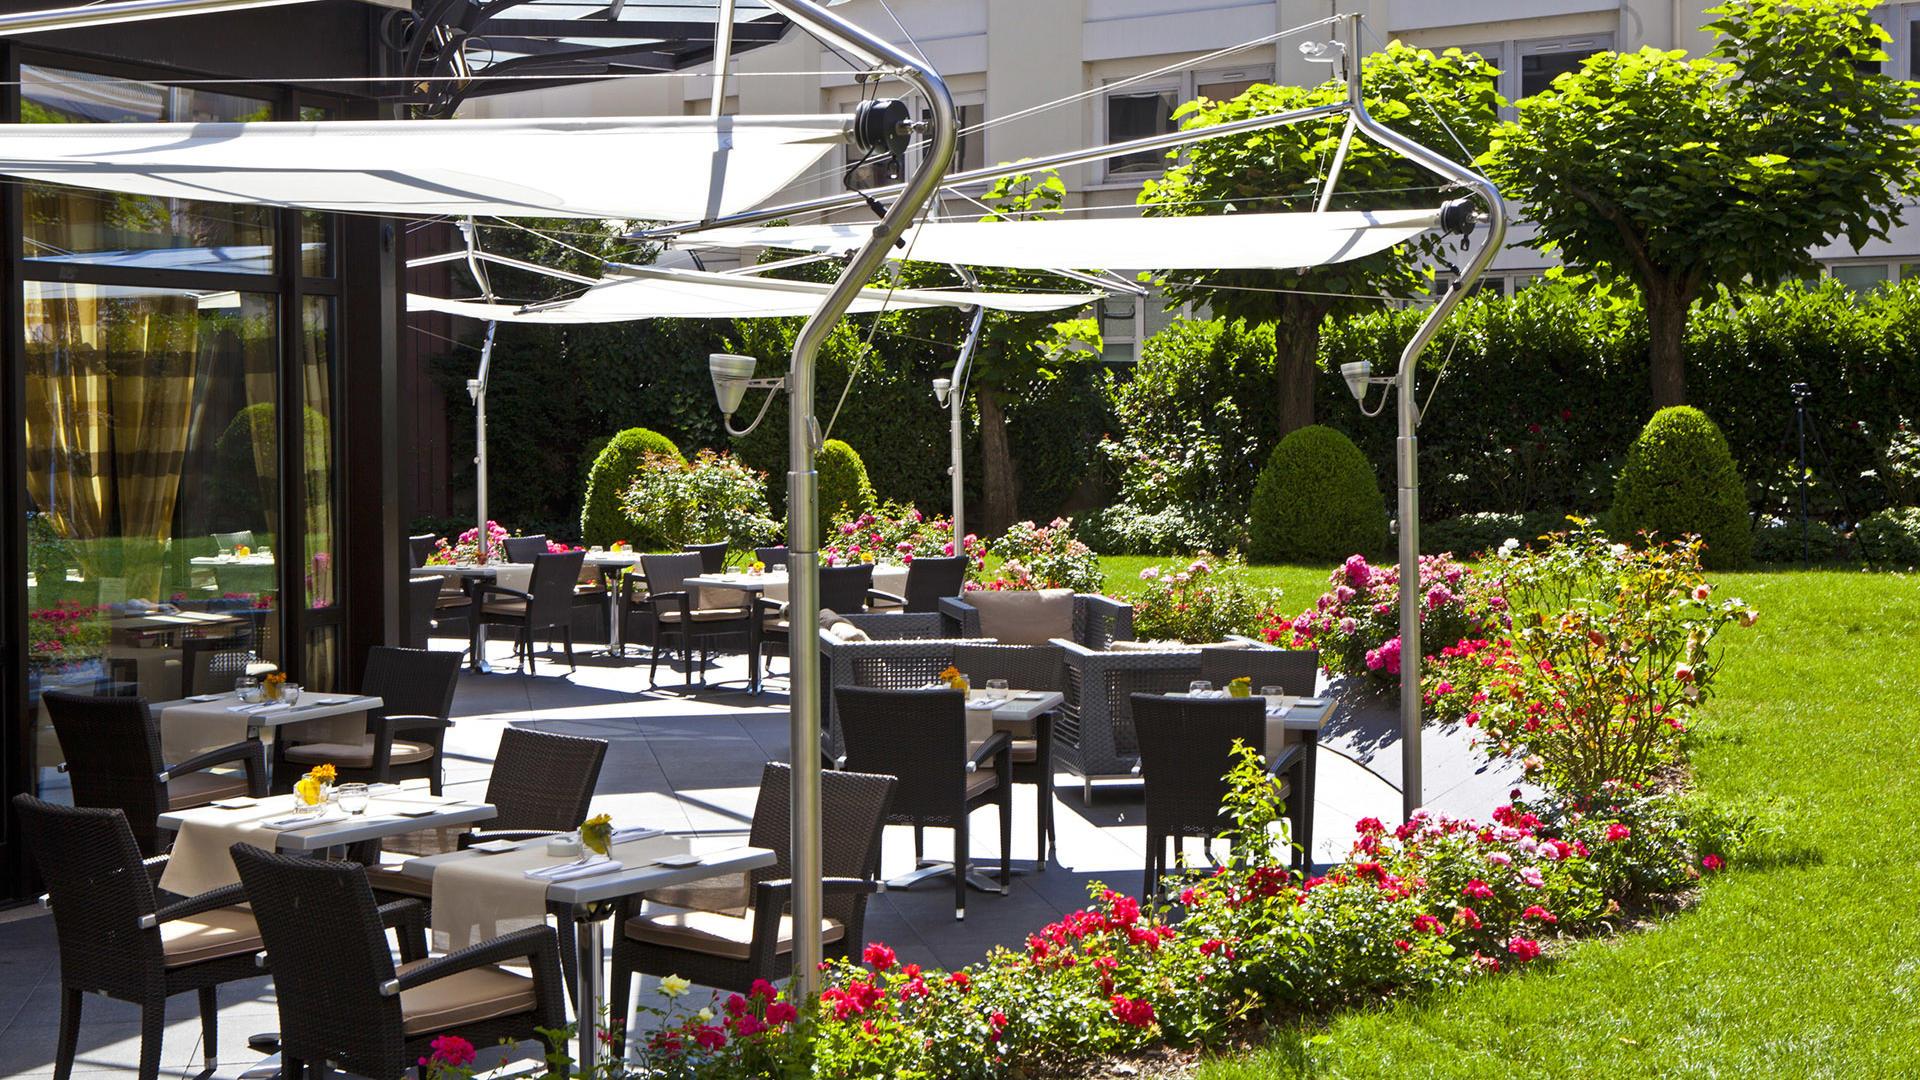 Terrace with Garden